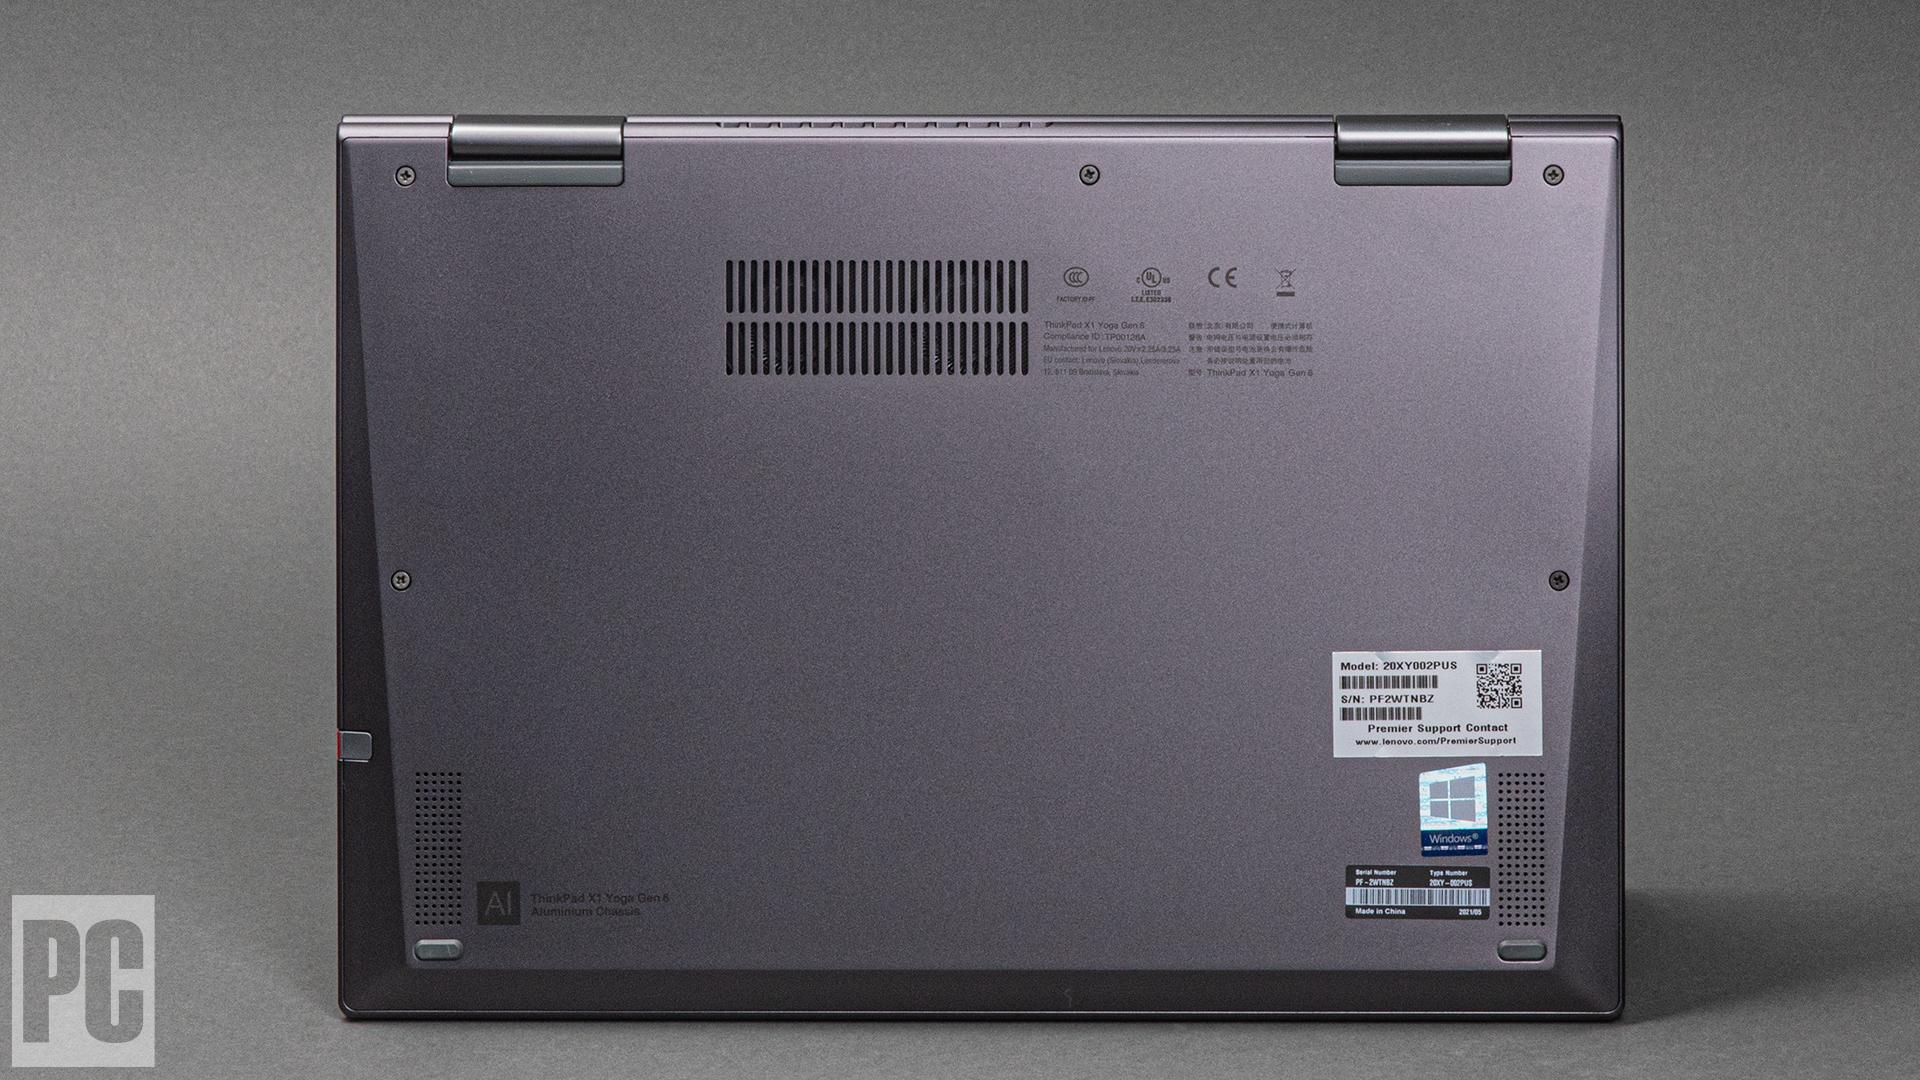 Lenovo ThinkPad X1 Yoga Gen 6 (2021) (lato inferiore)